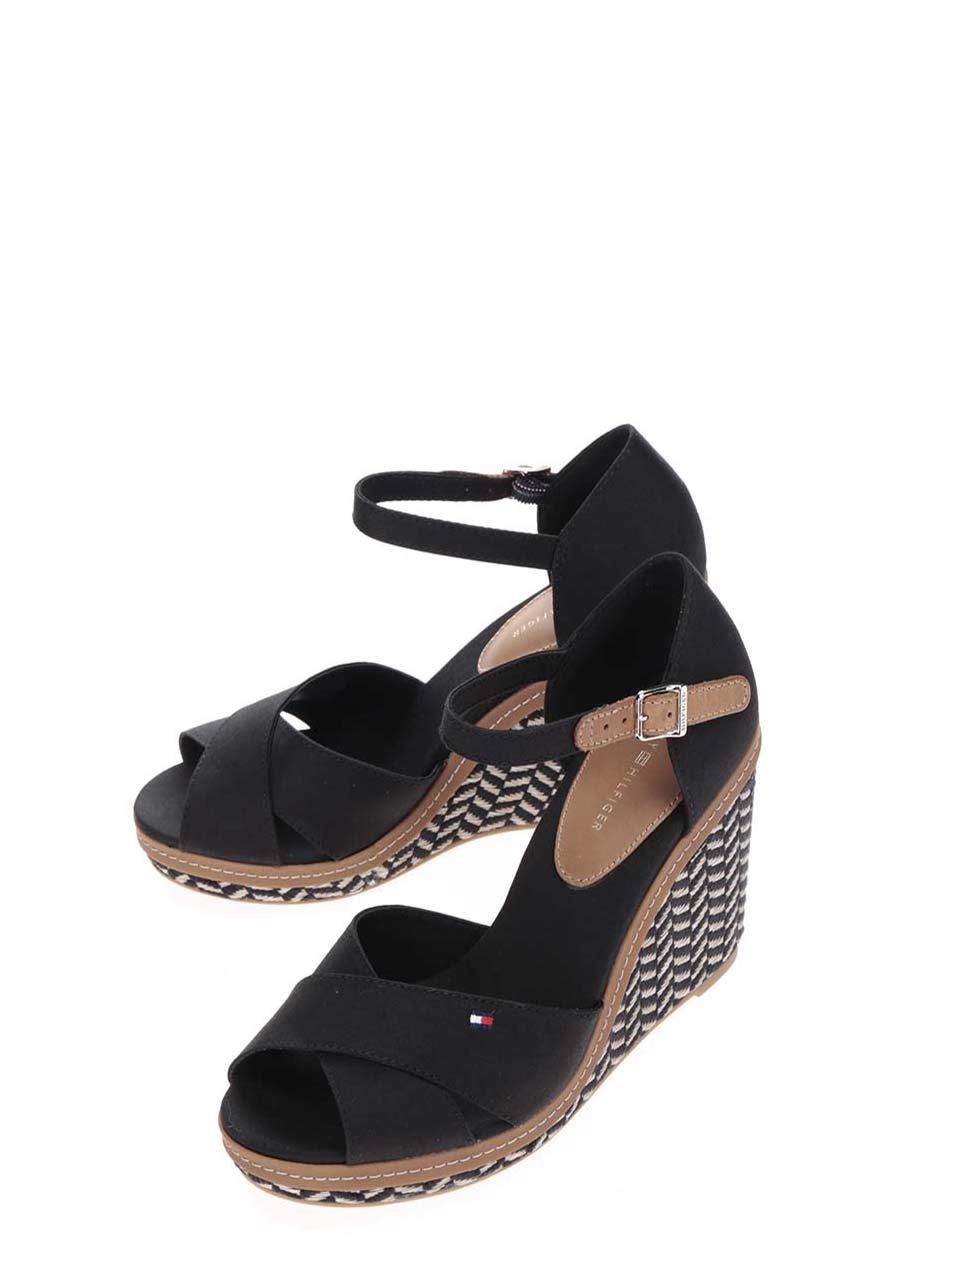 baaa8cabbd68 Čierne dámske sandále na platforme Tommy Hilfiger ...